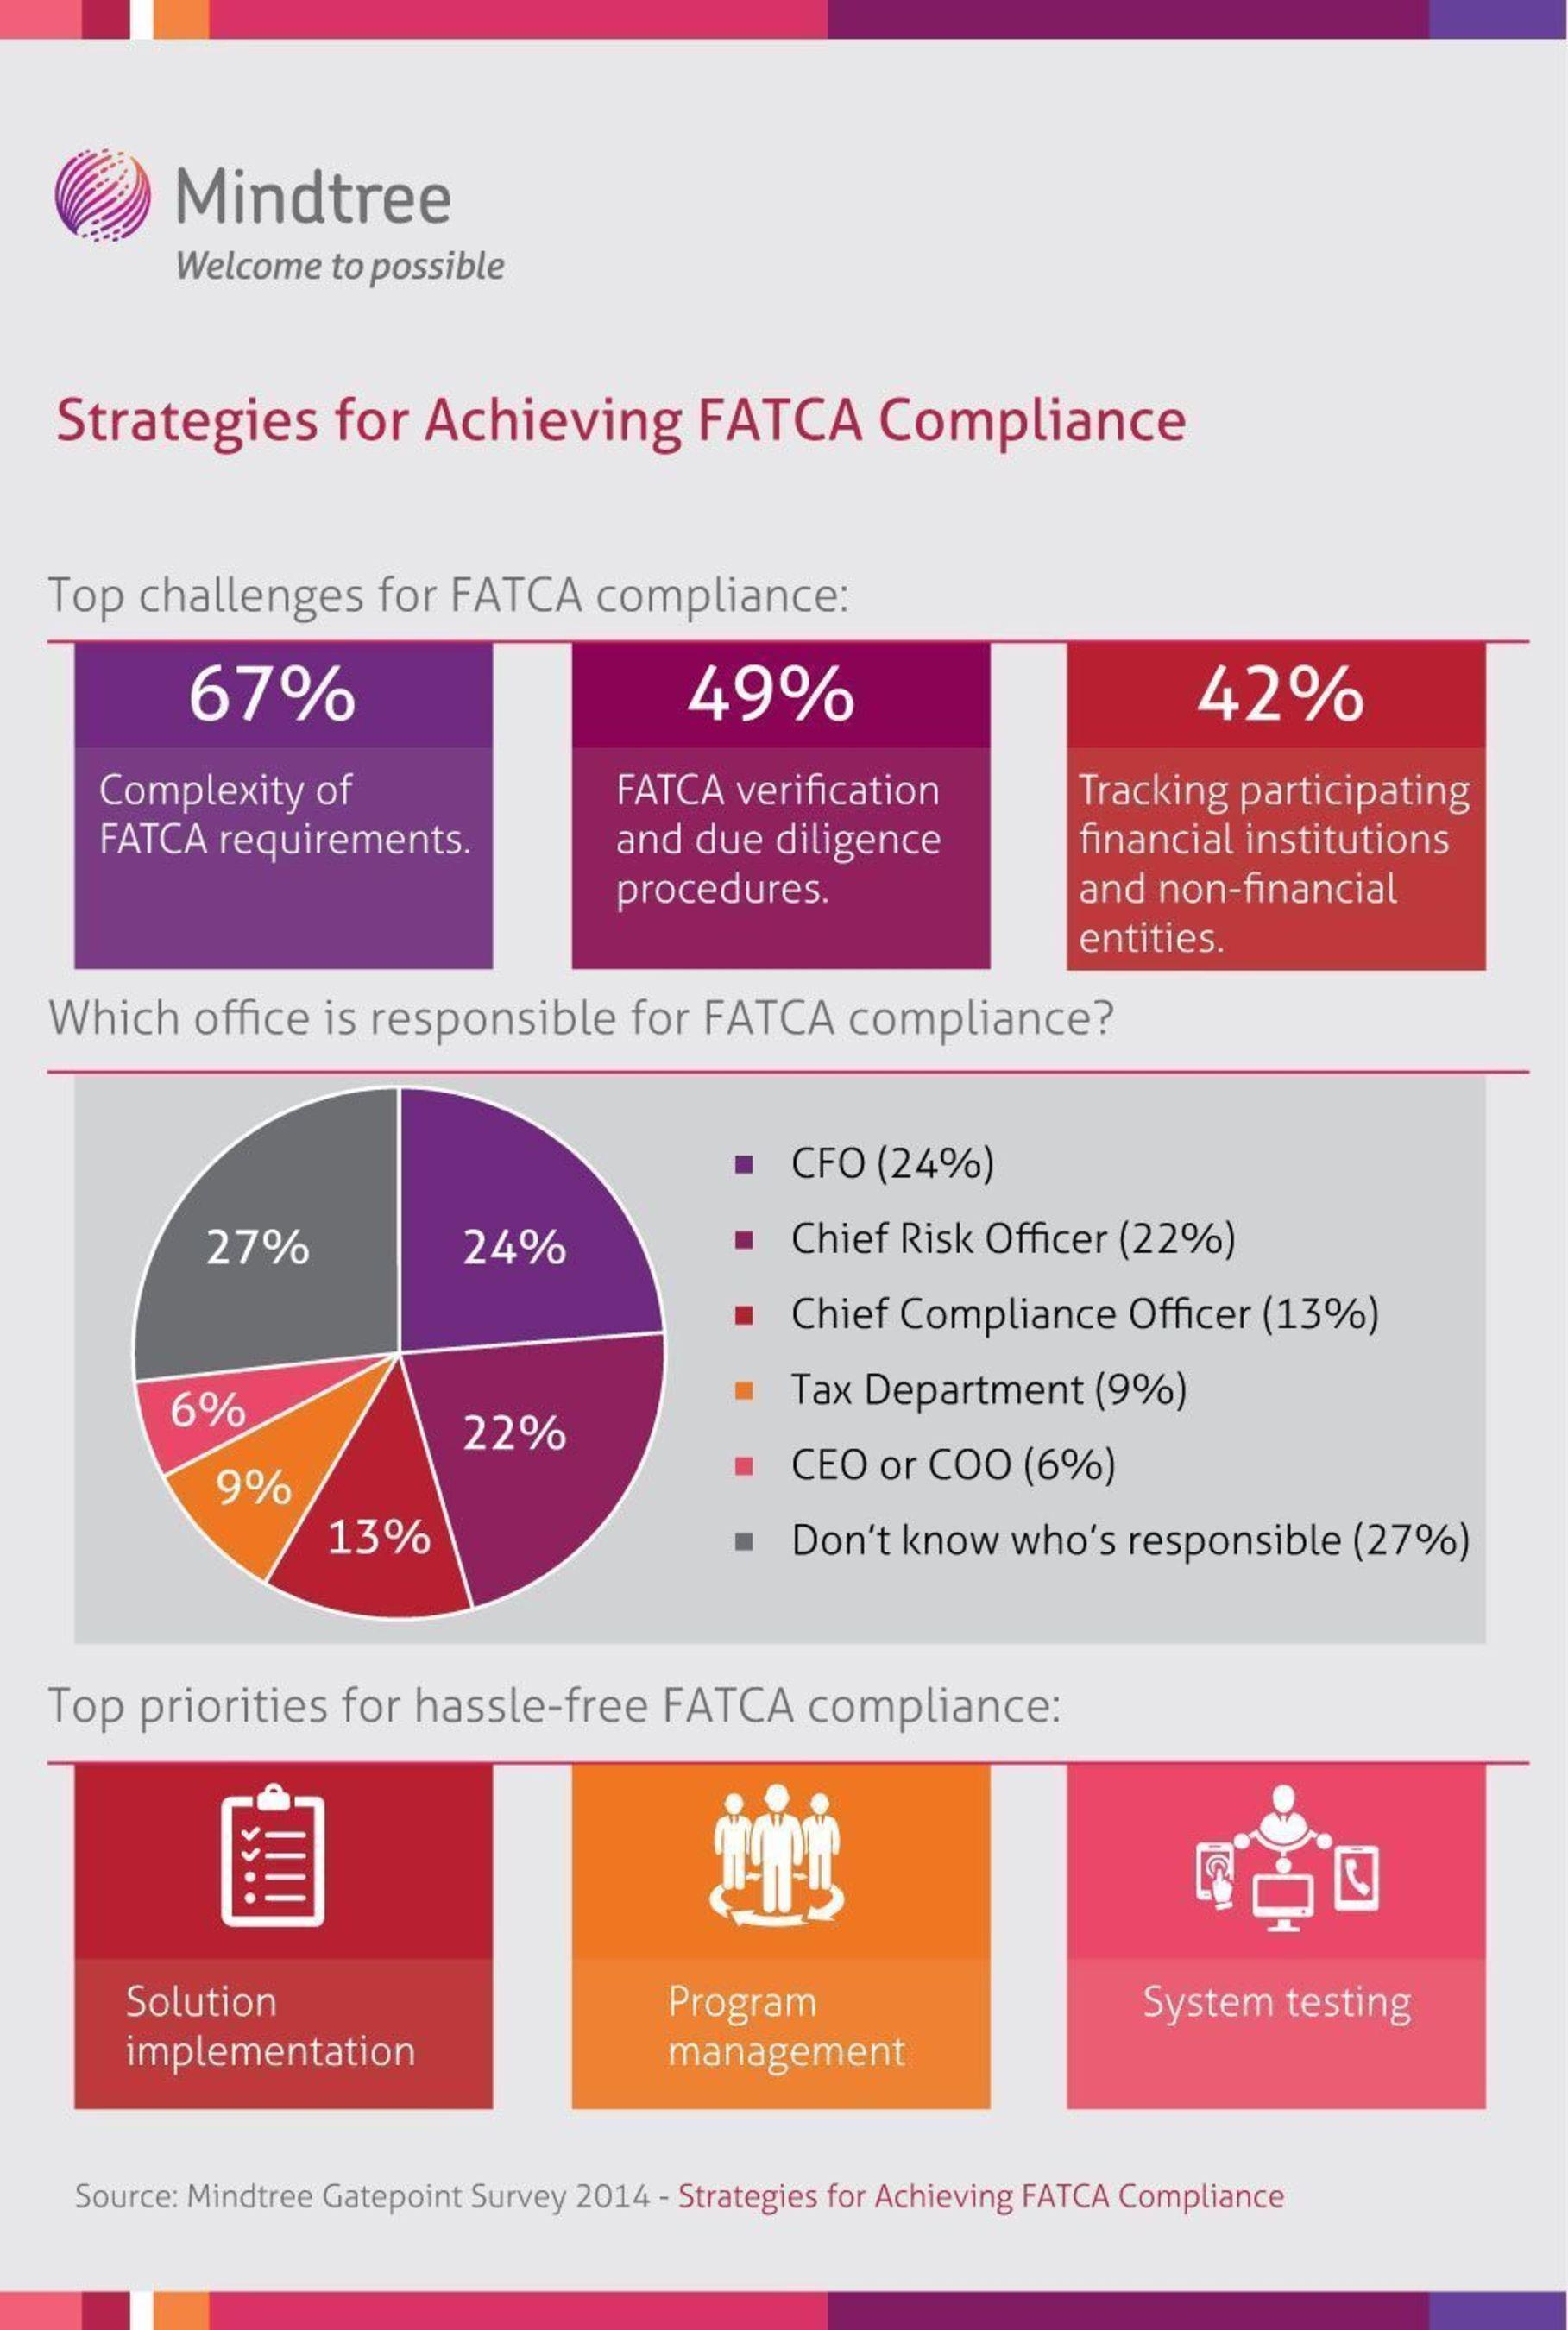 a) Strategies for Achieving FATCA Compliance; b) Survey; c) Mindtree (PRNewsFoto/Mindtree)